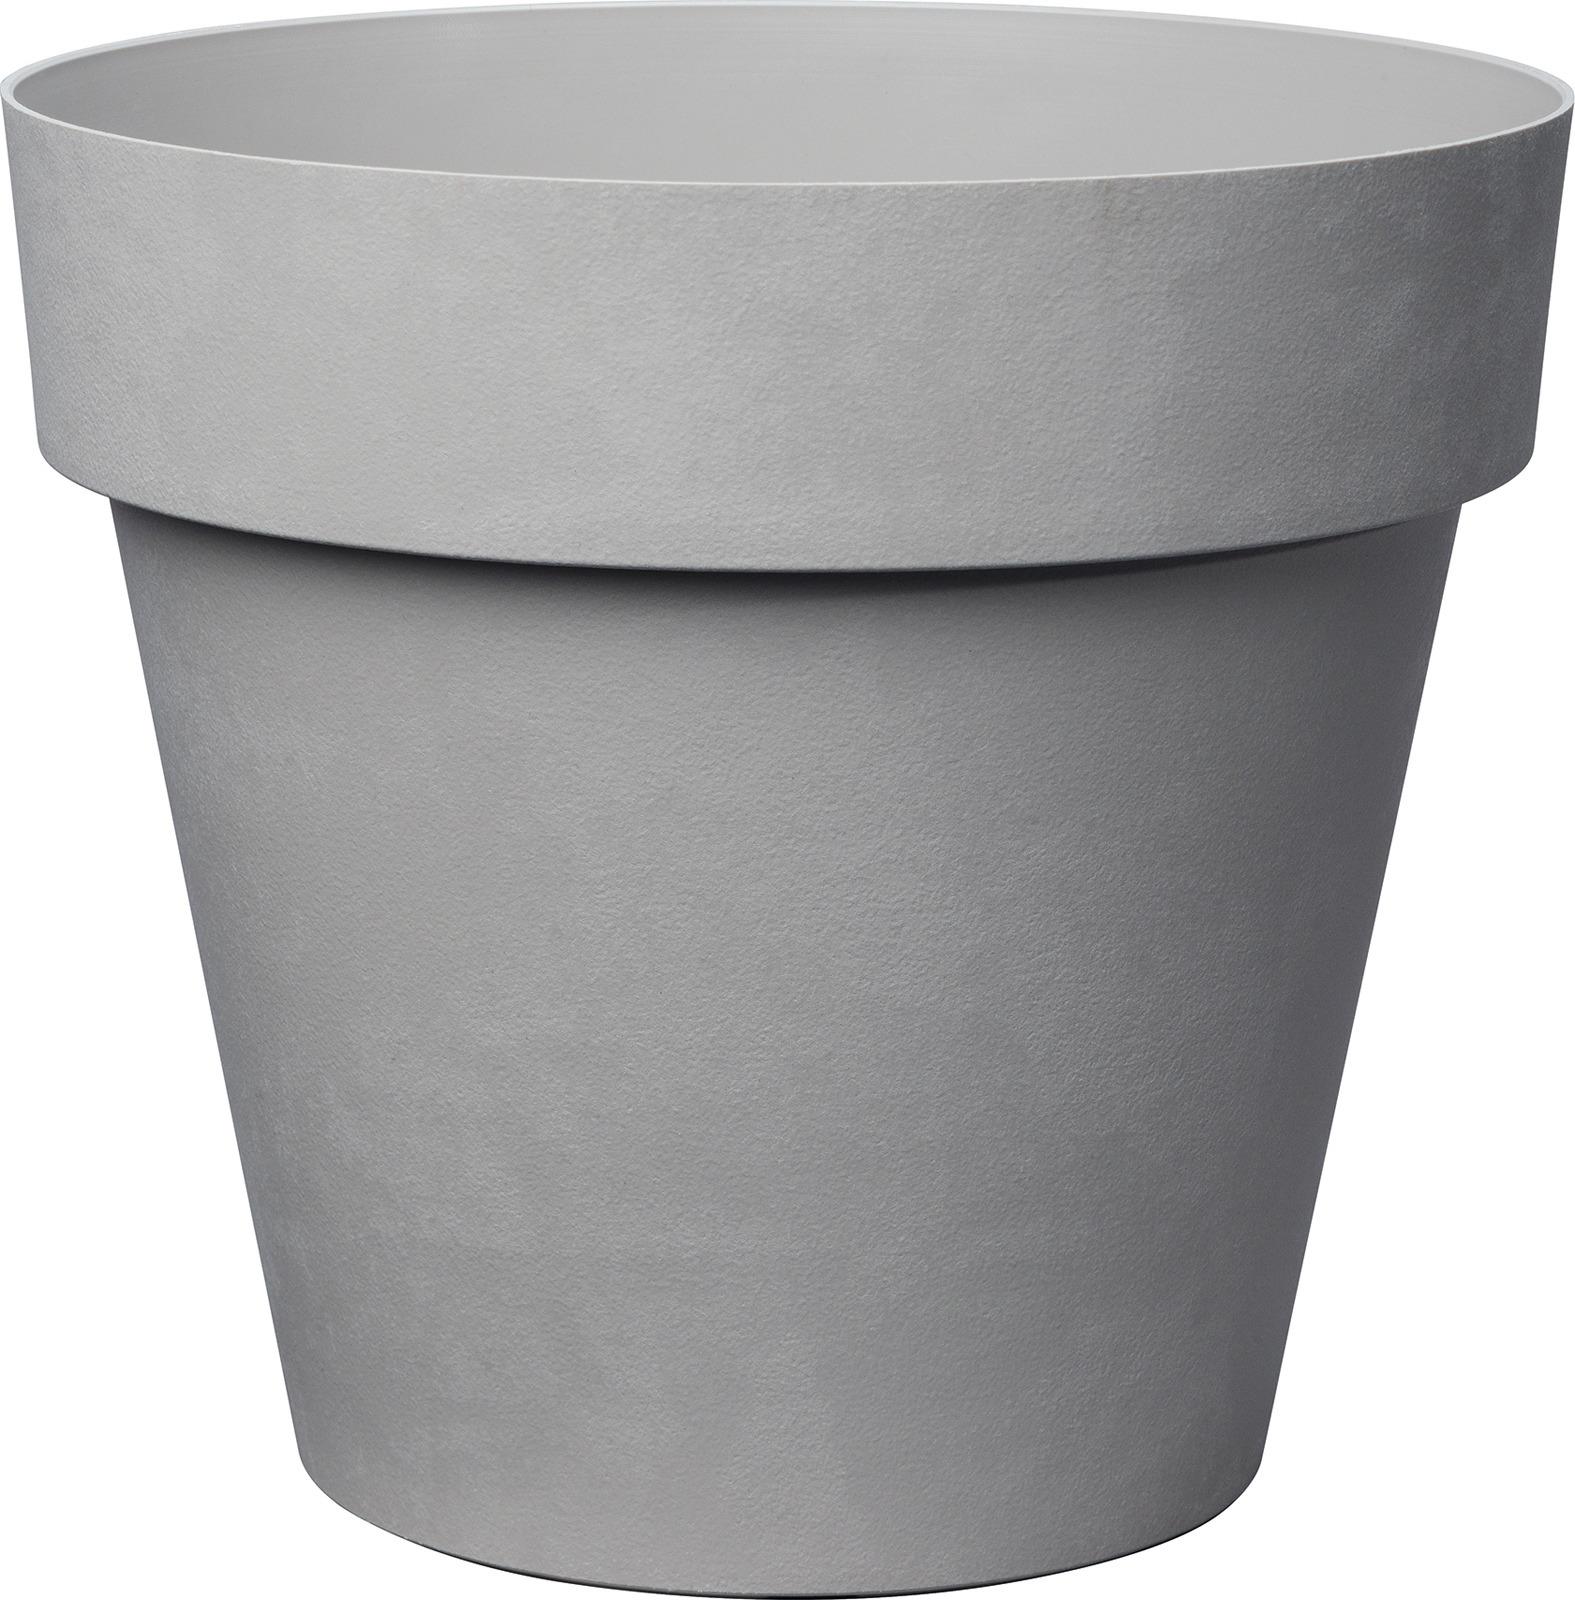 Горшок для цветов Deroma Лайк, 9DP2ZPZ309, светло-серый, 18 х 18 х 16,5 см